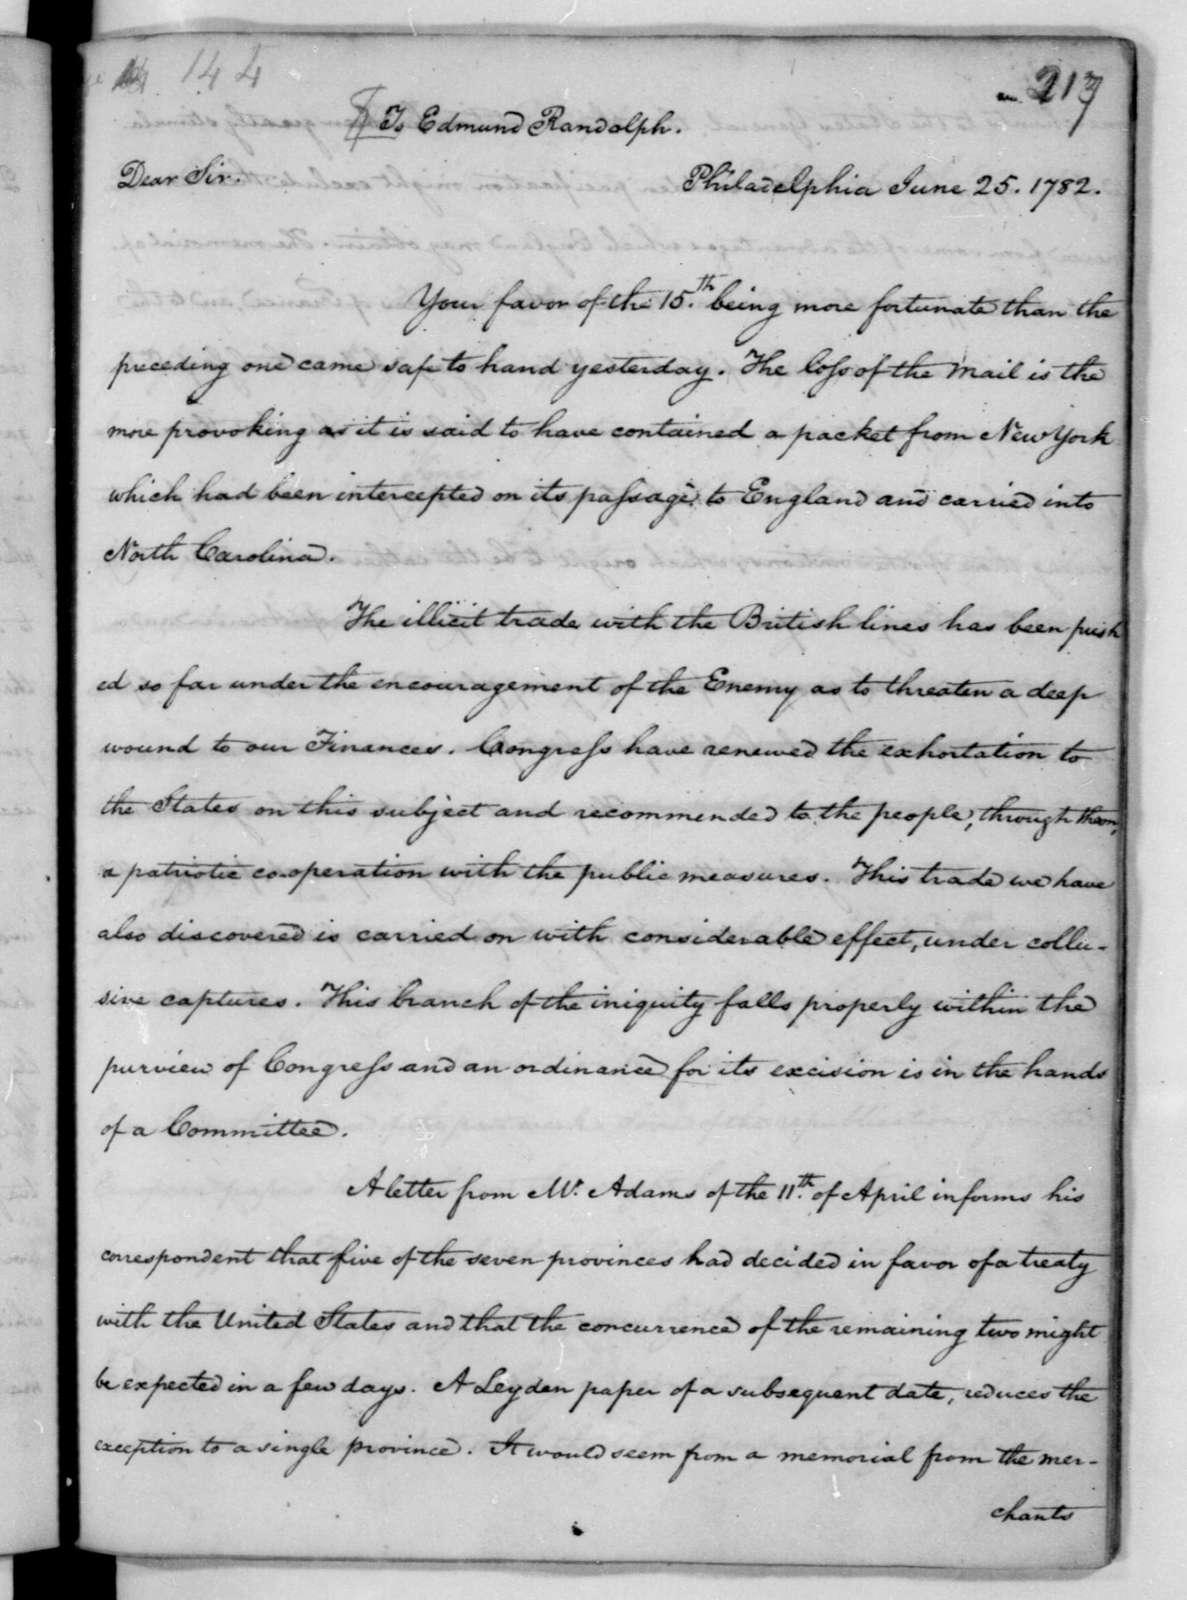 James Madison to Edmund Randolph, June 25, 1782.